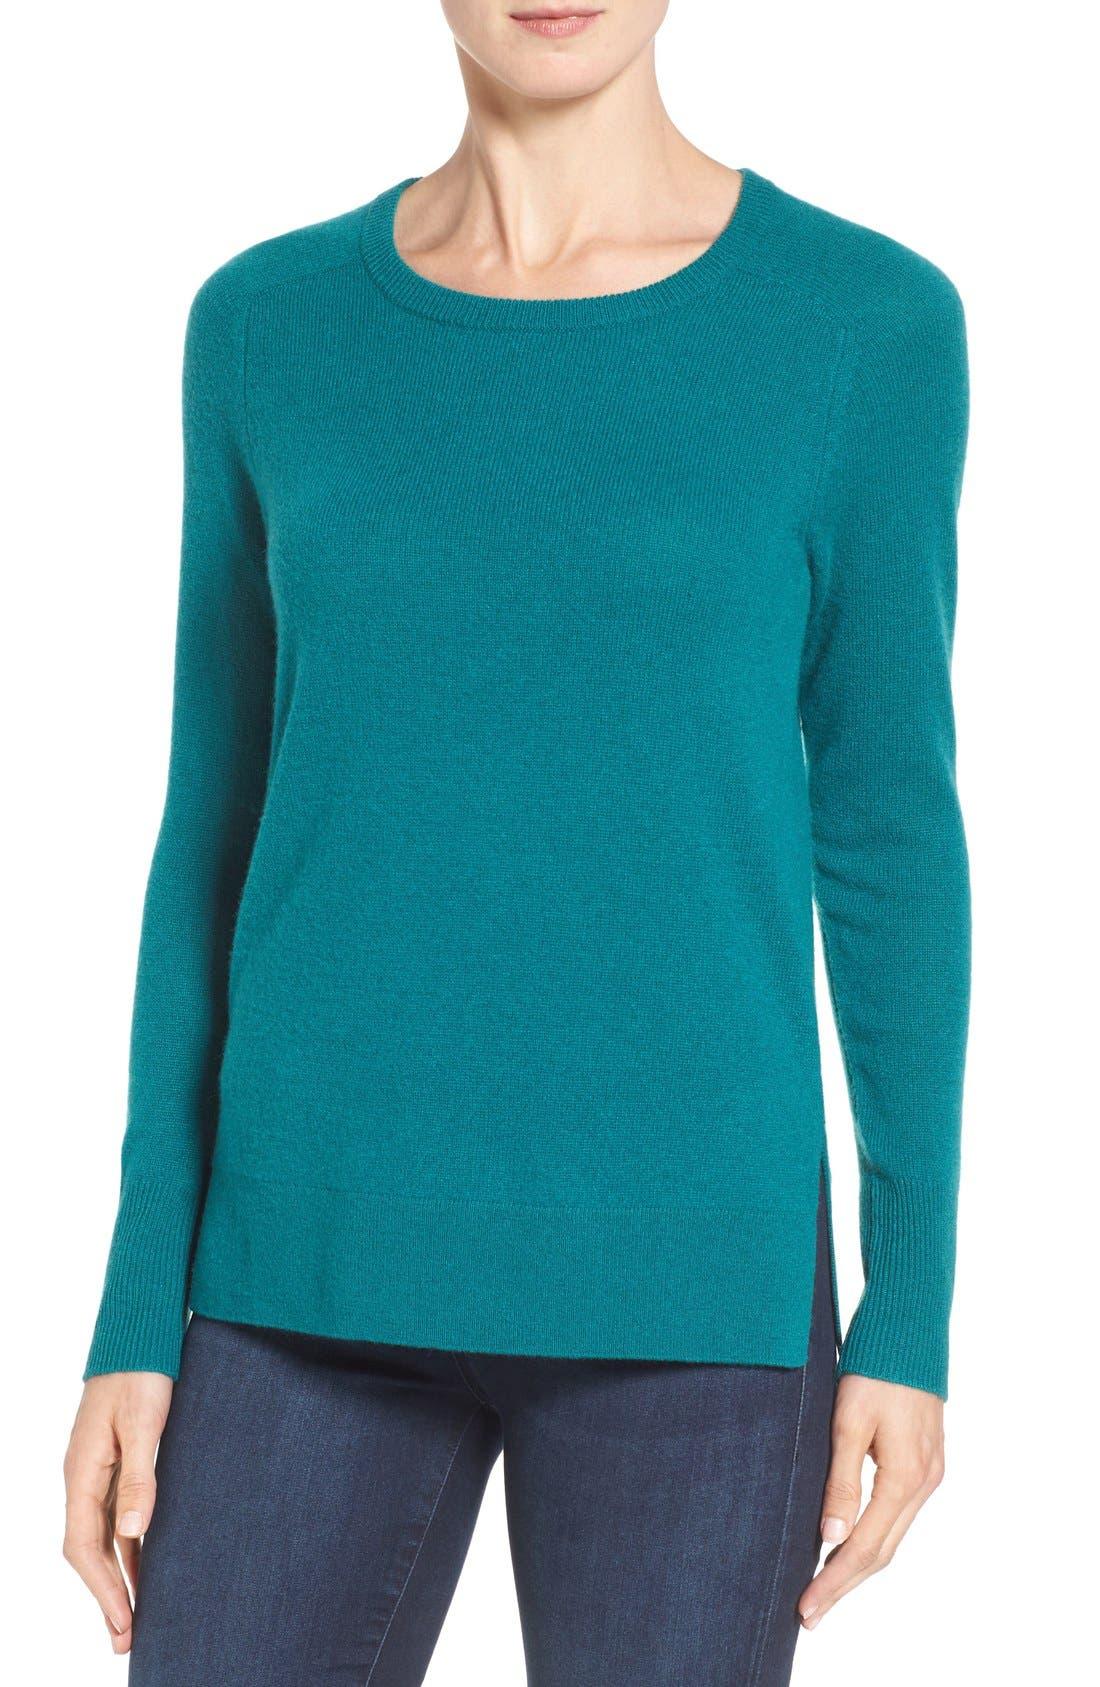 Alternate Image 1 Selected - Halogen® Crewneck Lightweight Cashmere Sweater (Regular & Petite)